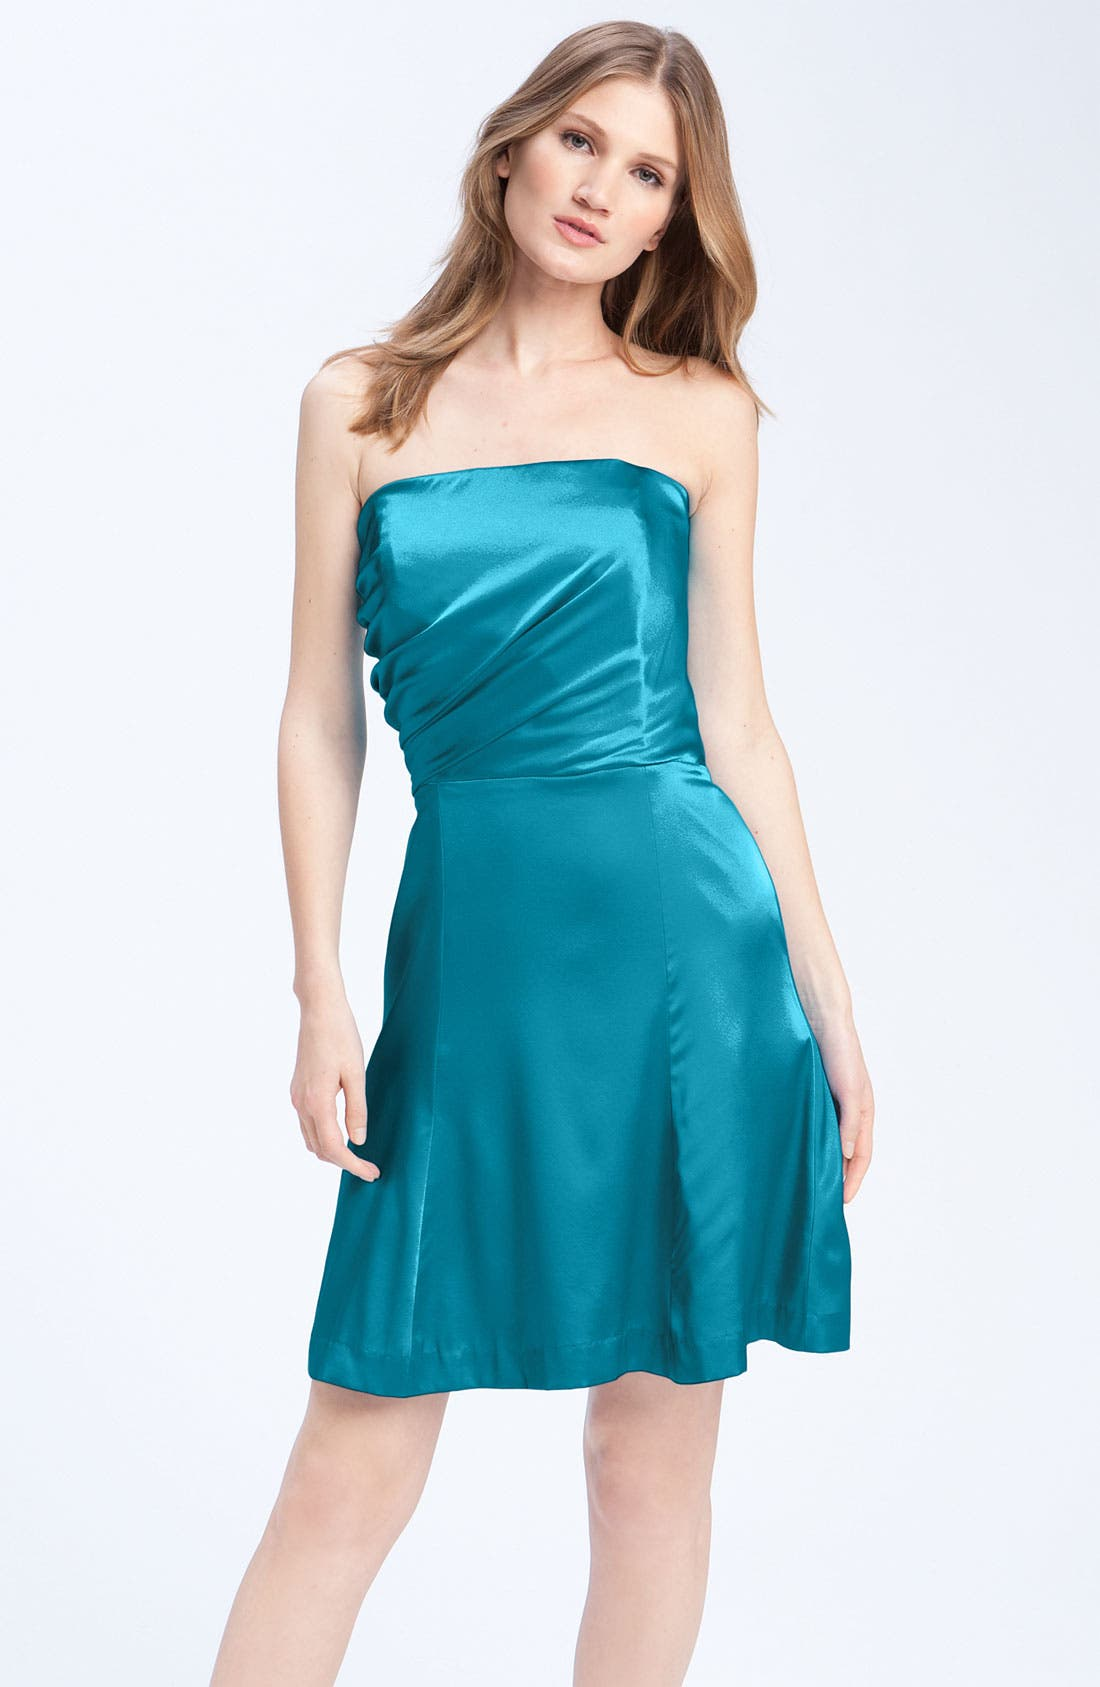 Alternate Image 1 Selected - Anna Elyse Bridesmaids Strapless Charmeuse Dress